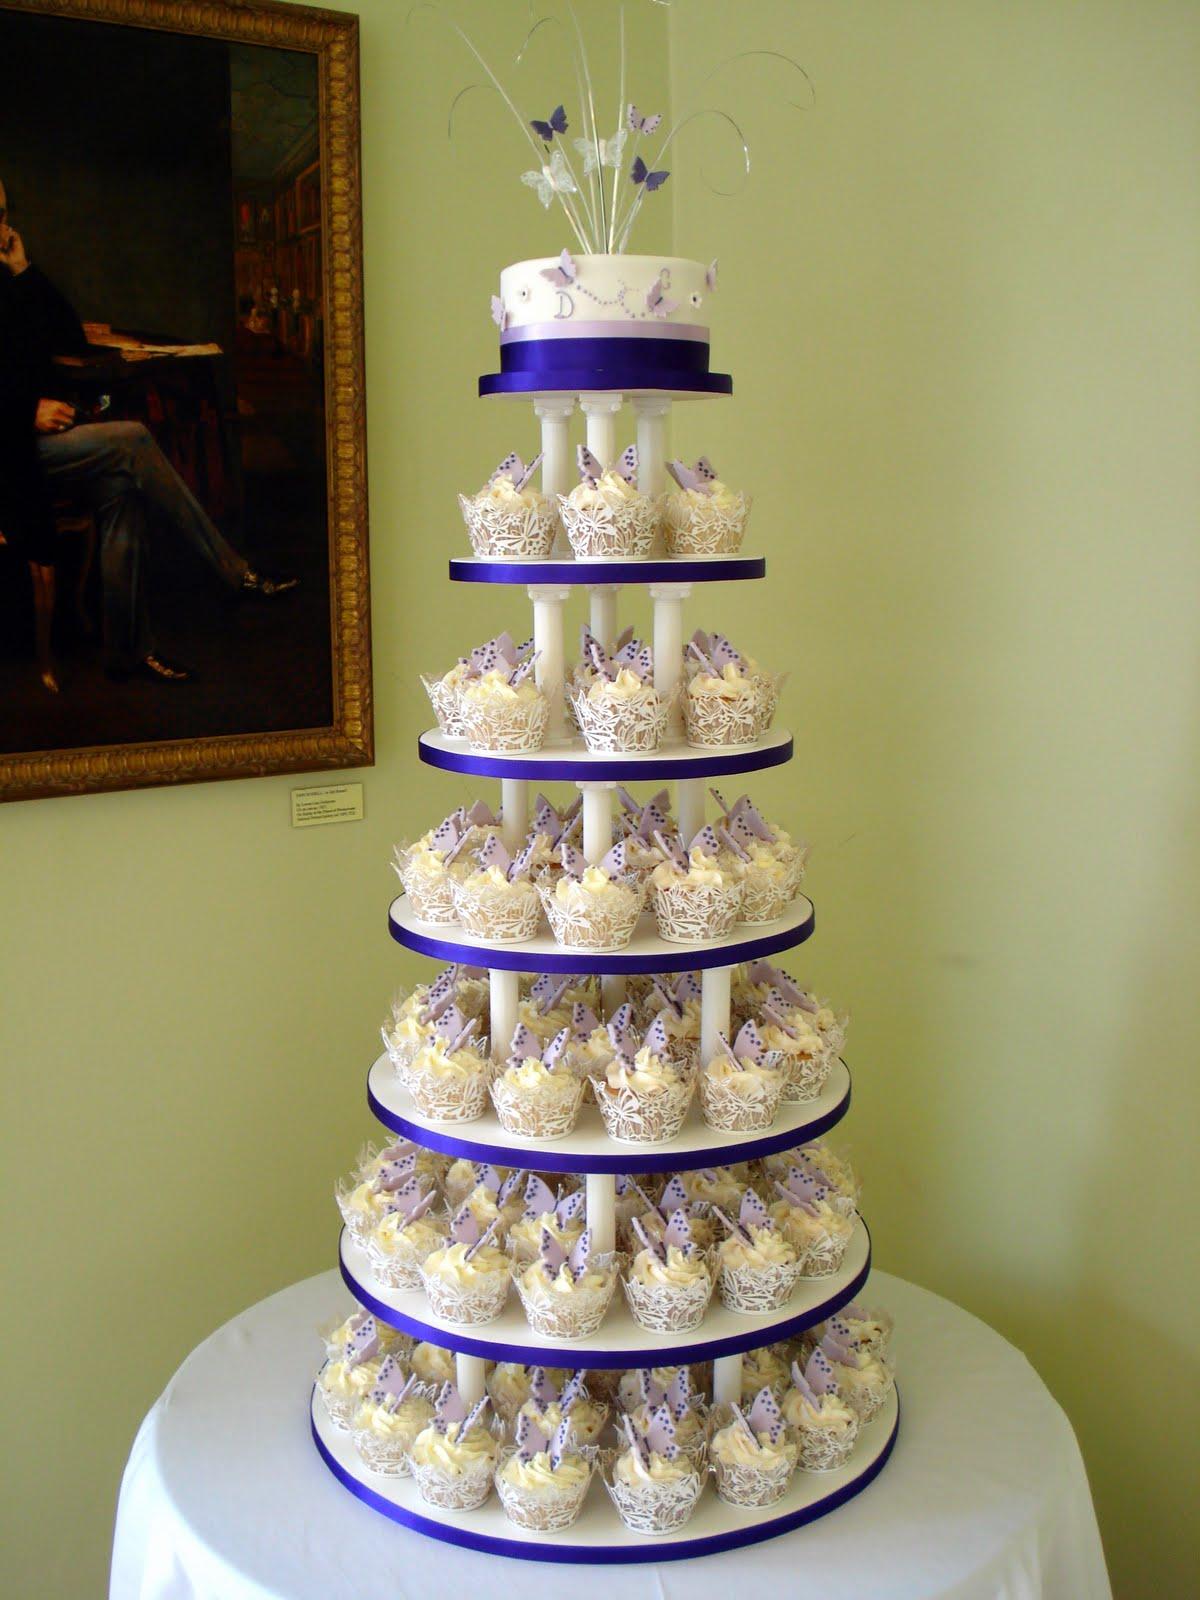 Custom Cake Designs Uk : Custom Cake Design: Wedding Butterfly Cupcake Tower